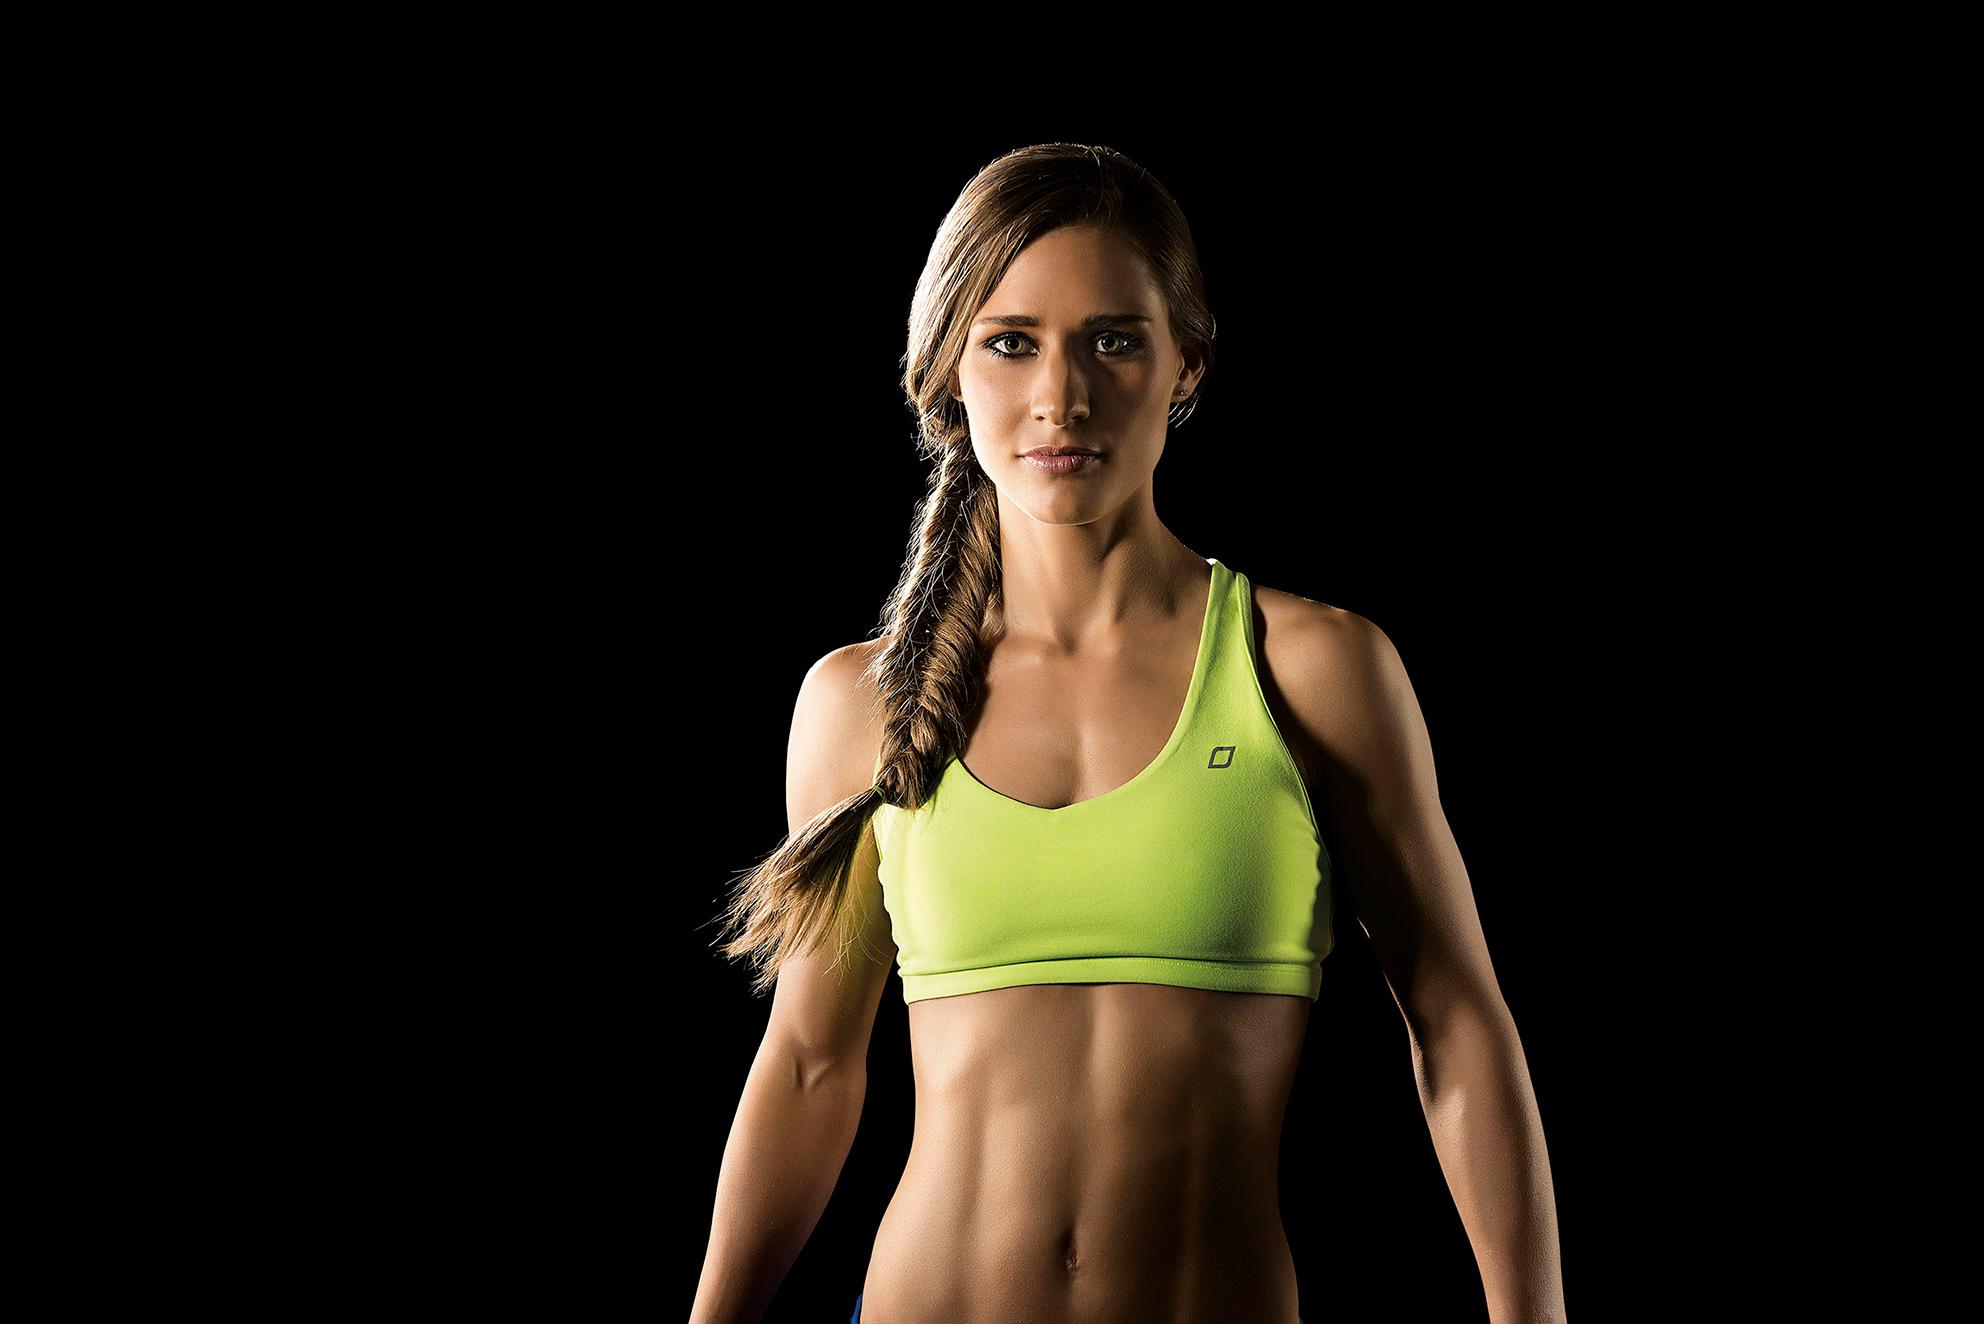 leilani-fitness-photography-front-view-brandon-barnard-professional-photographer.jpg